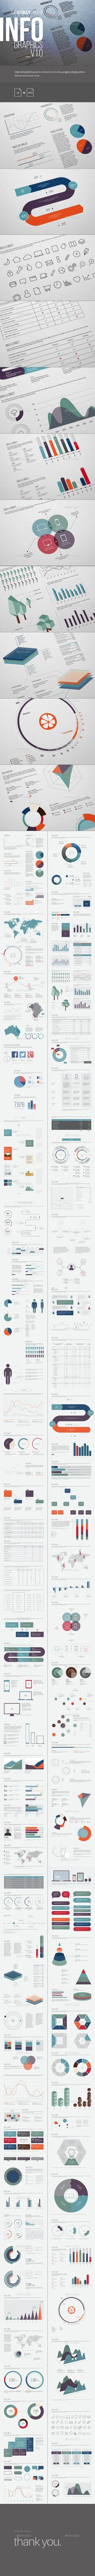 Infographic Elements v1.0 - Infographics